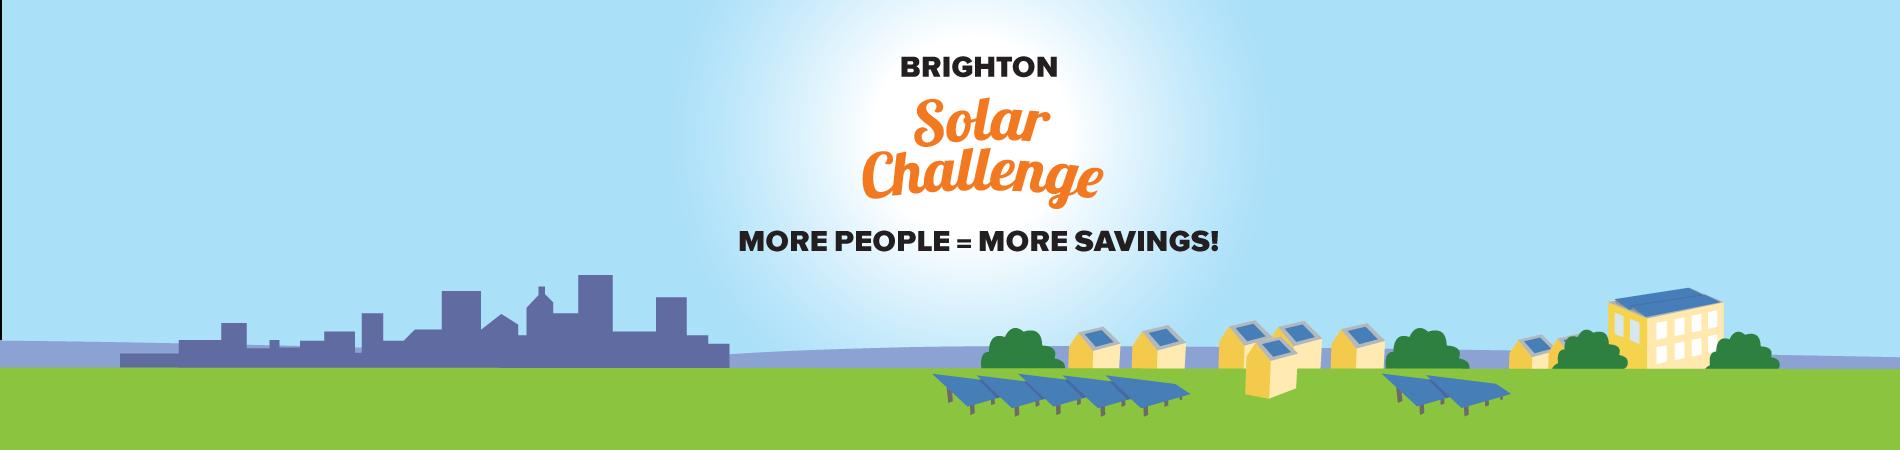 Brighton-Solar-Challenge-Hero-Banner-2